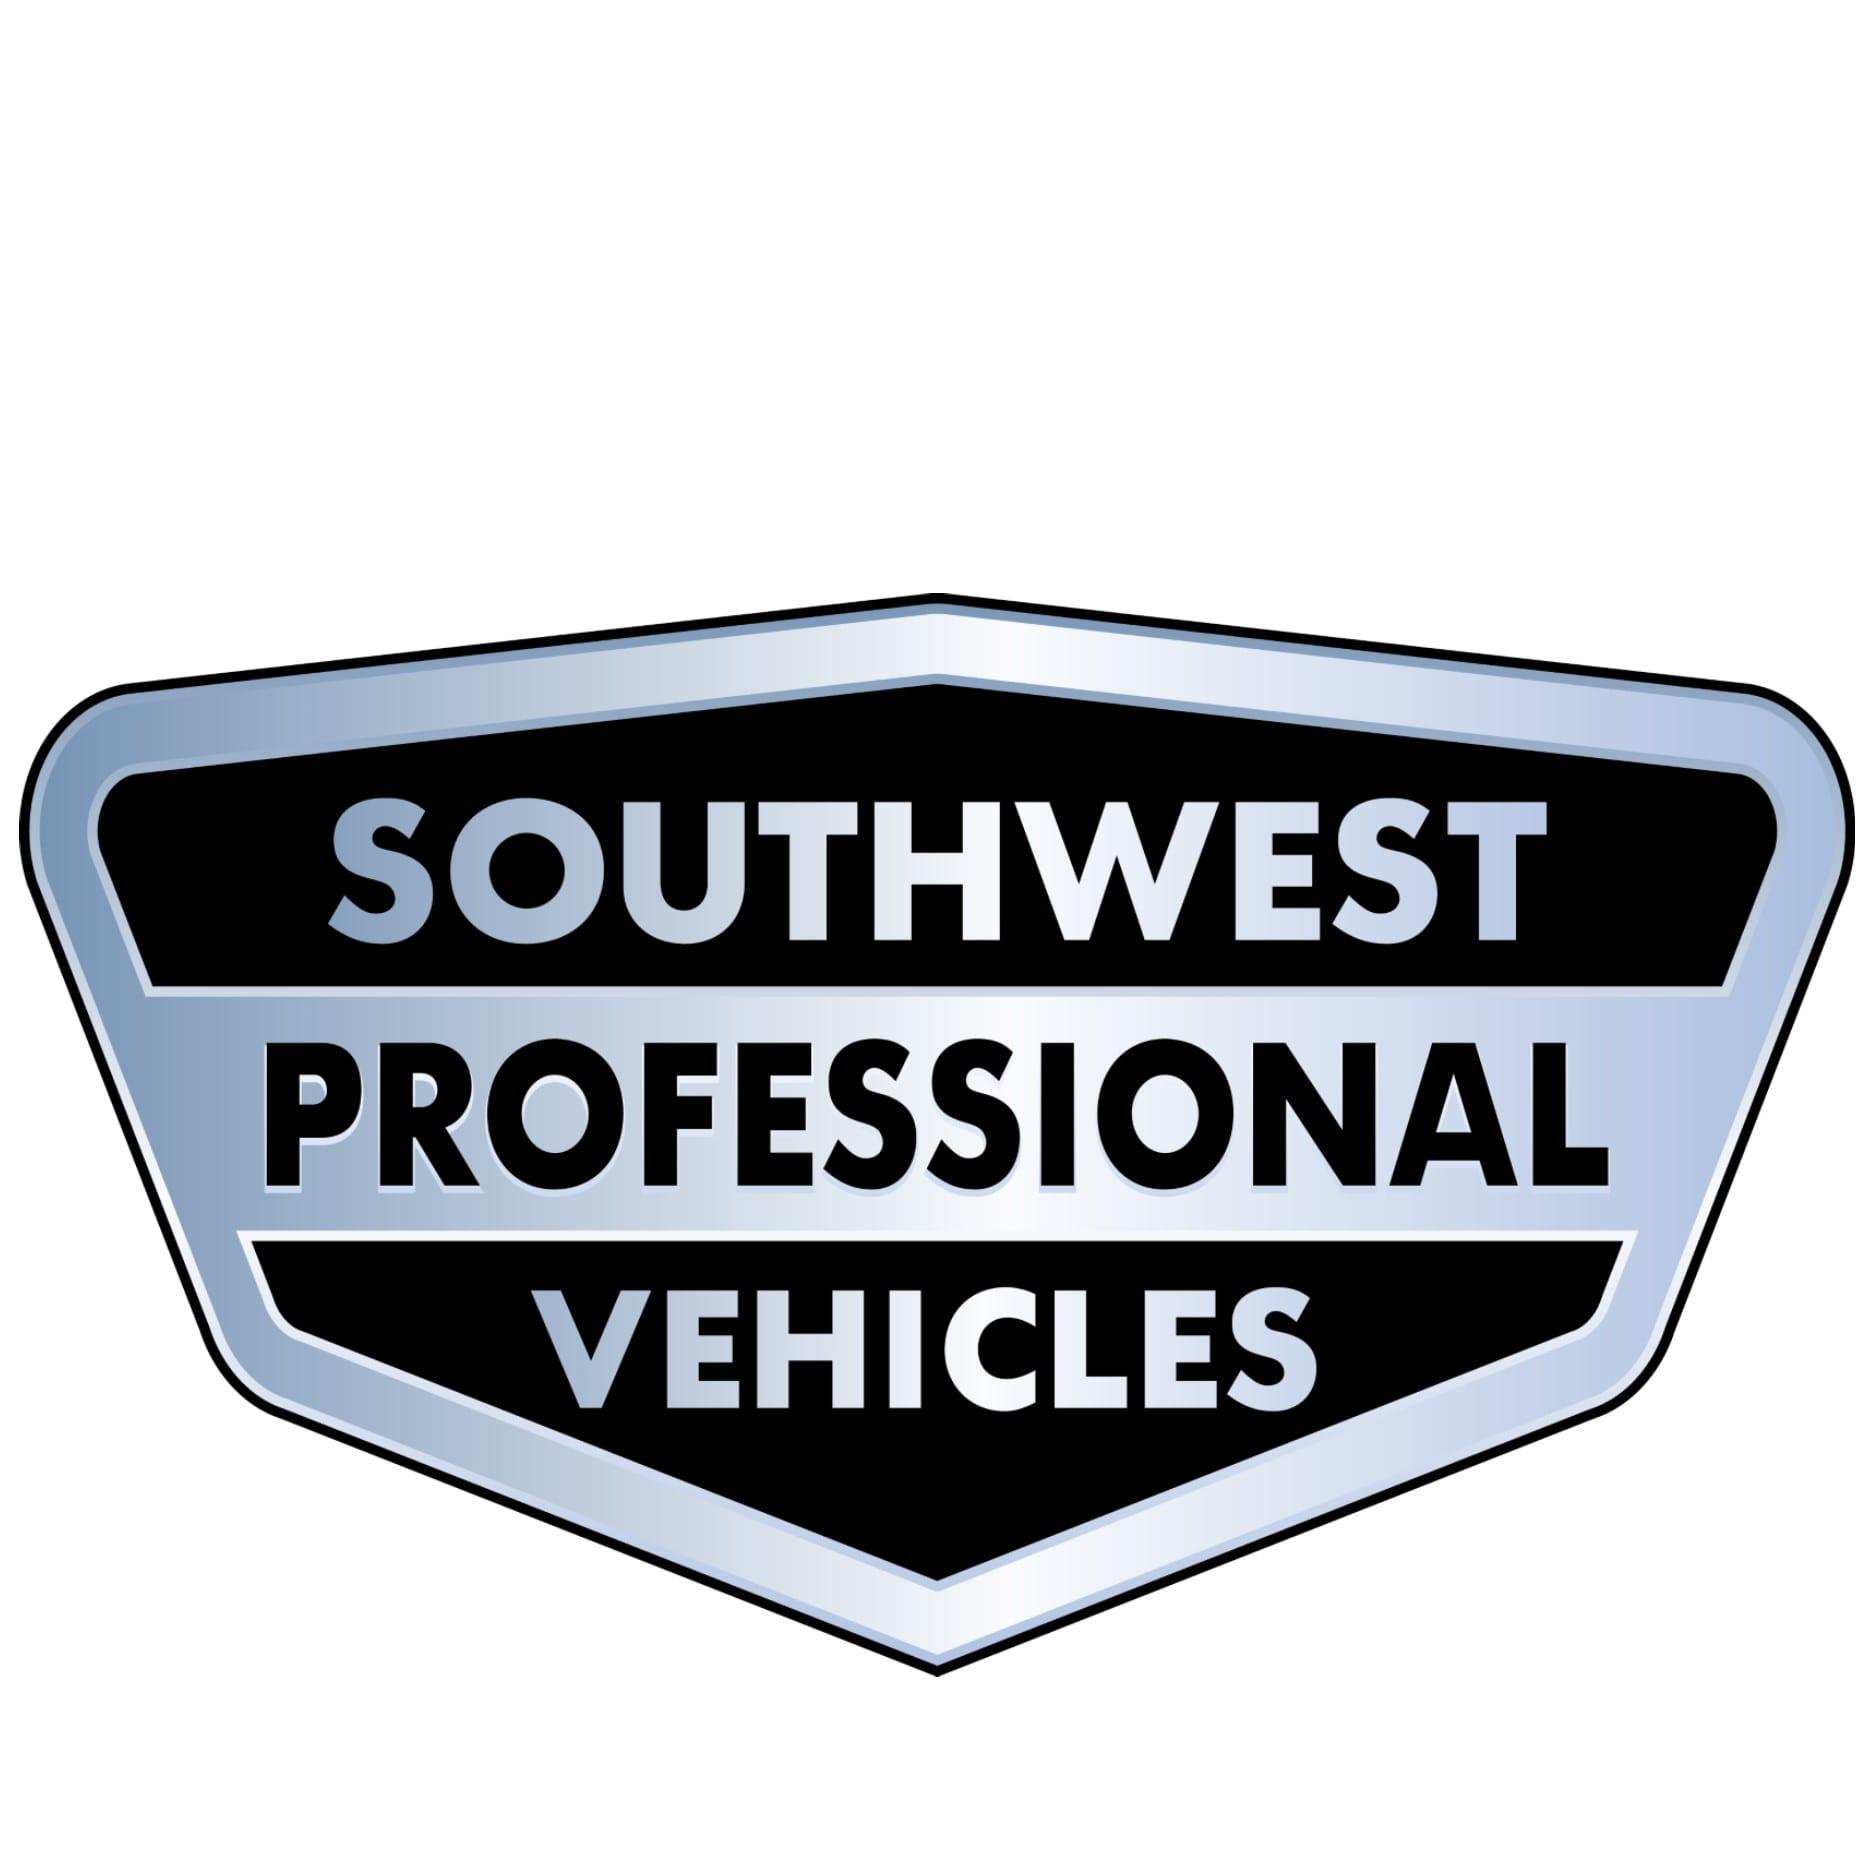 SPV Square - Advertising Agency Springfield Missouri